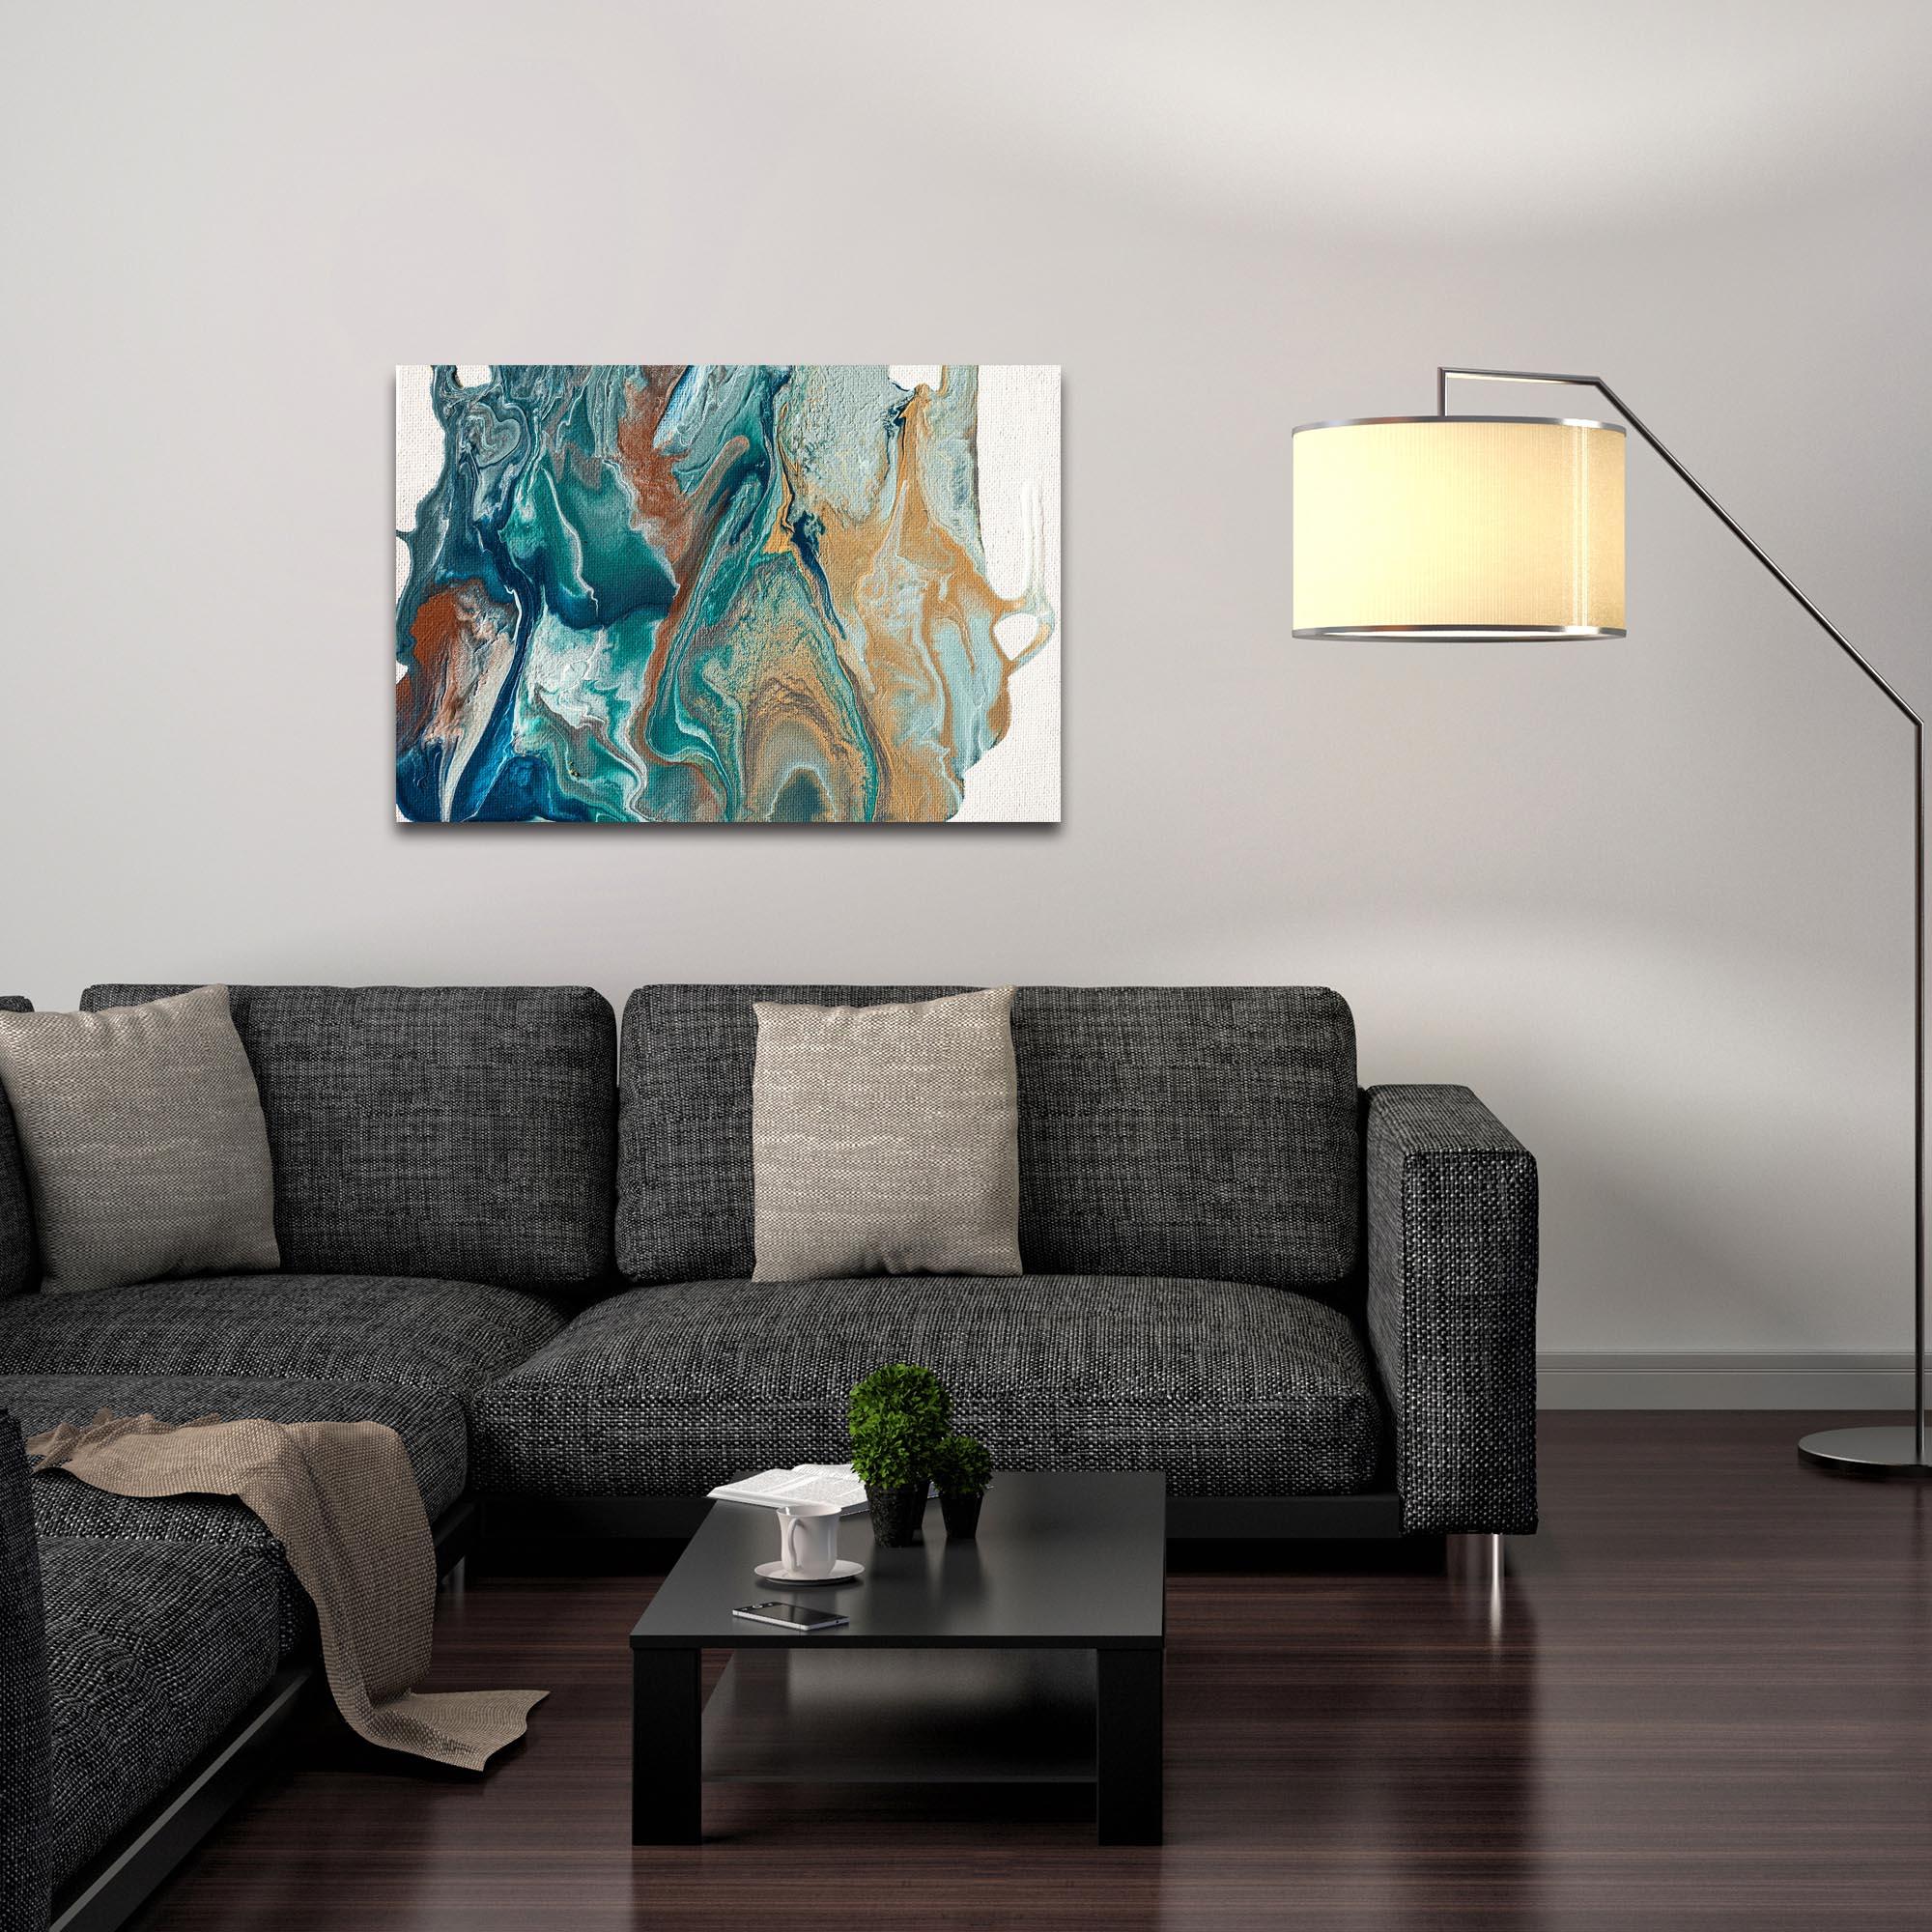 Abstract Wall Art 'Earth 2' - Urban Splatter Decor on Metal or Plexiglass - Lifestyle View